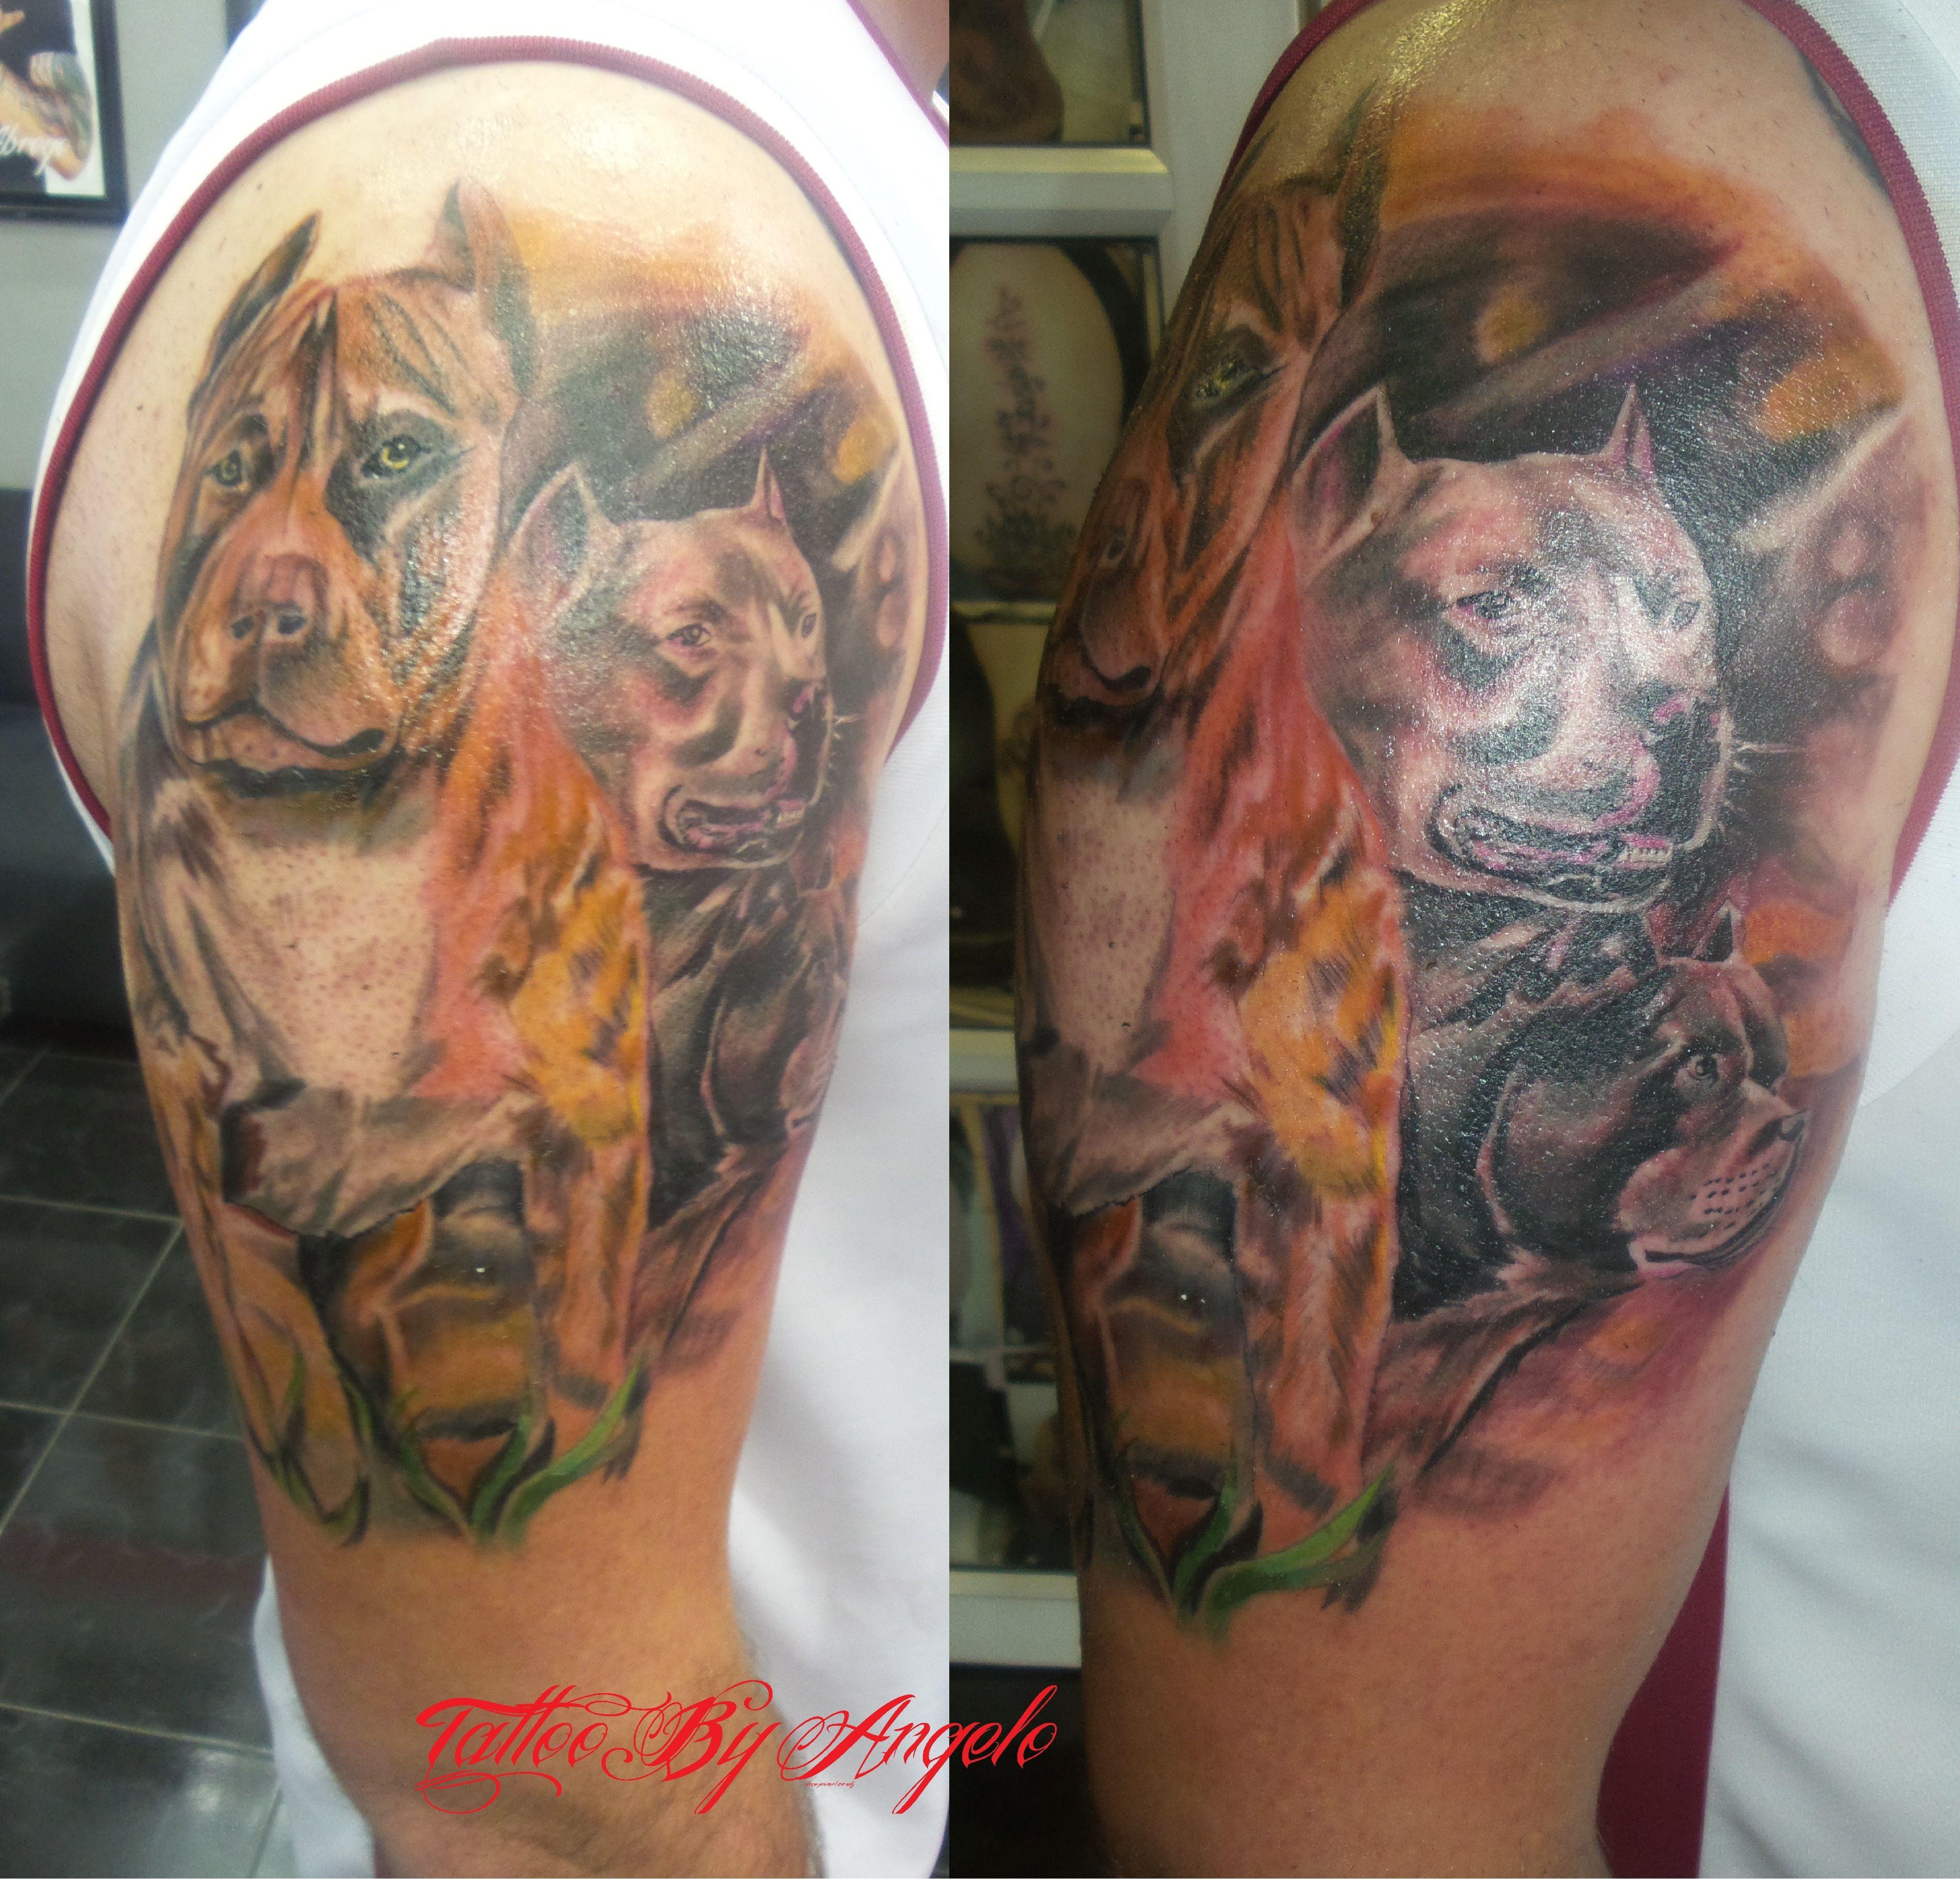 Tattoo By Angelo @ Rising Dragon Tattoo Fourways. joburgink@gmail.com, 0114677350